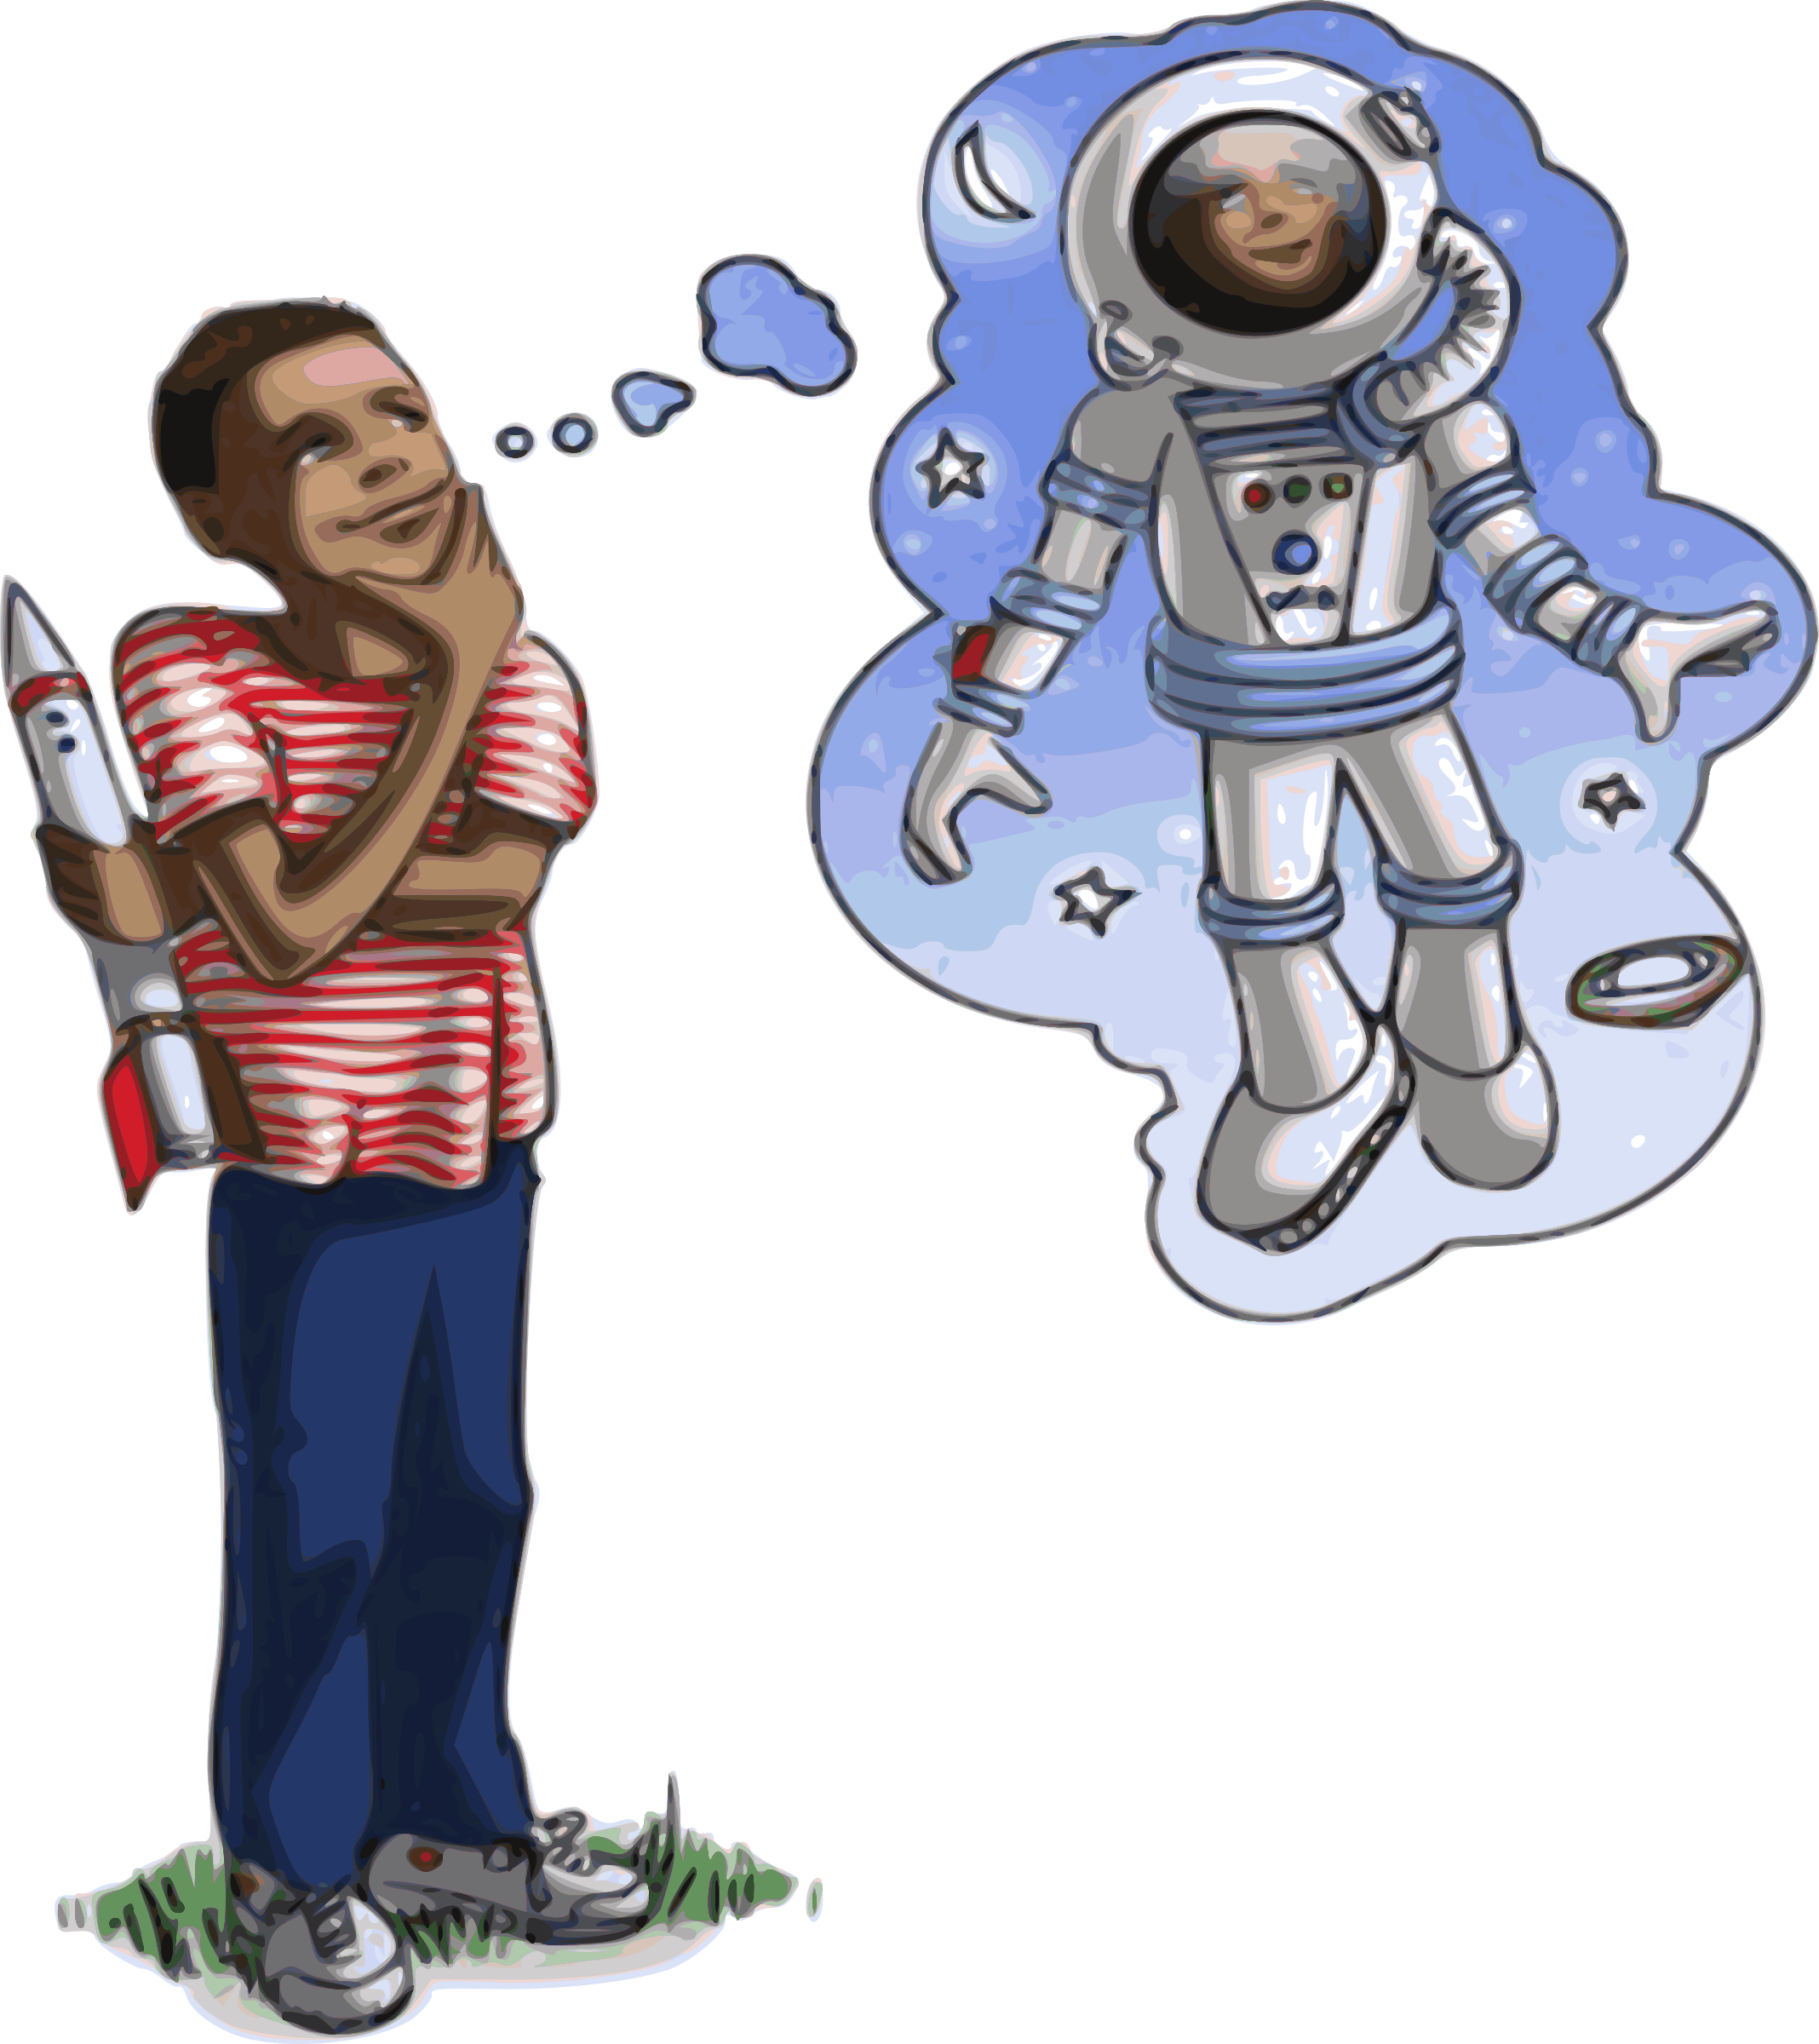 Spaceship clipart astronaut. Dreams big image png